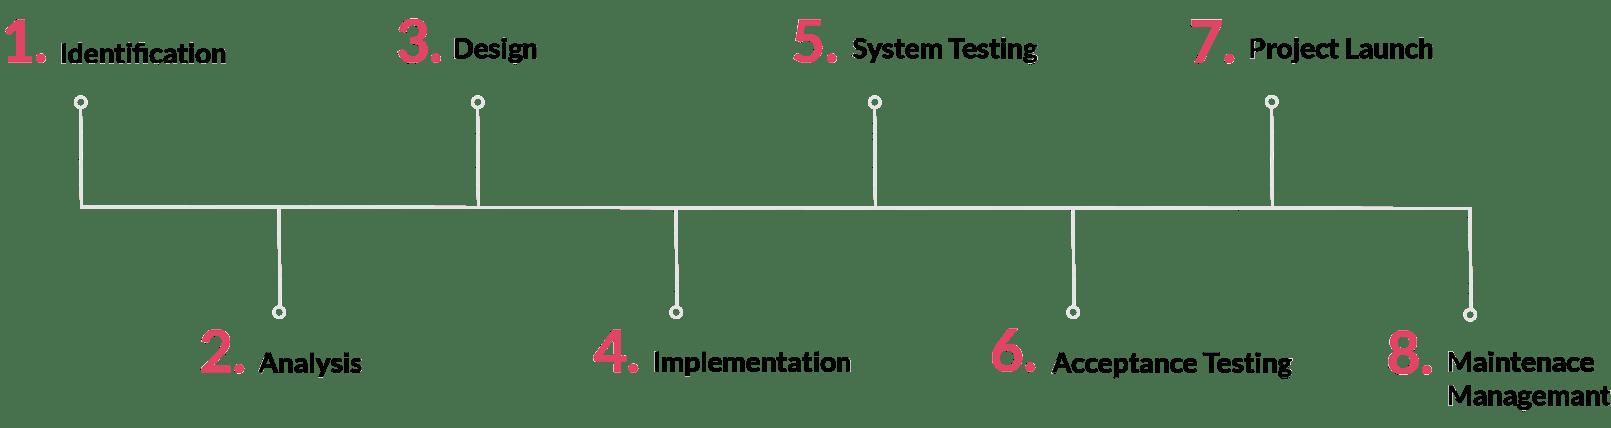 software maintenance process